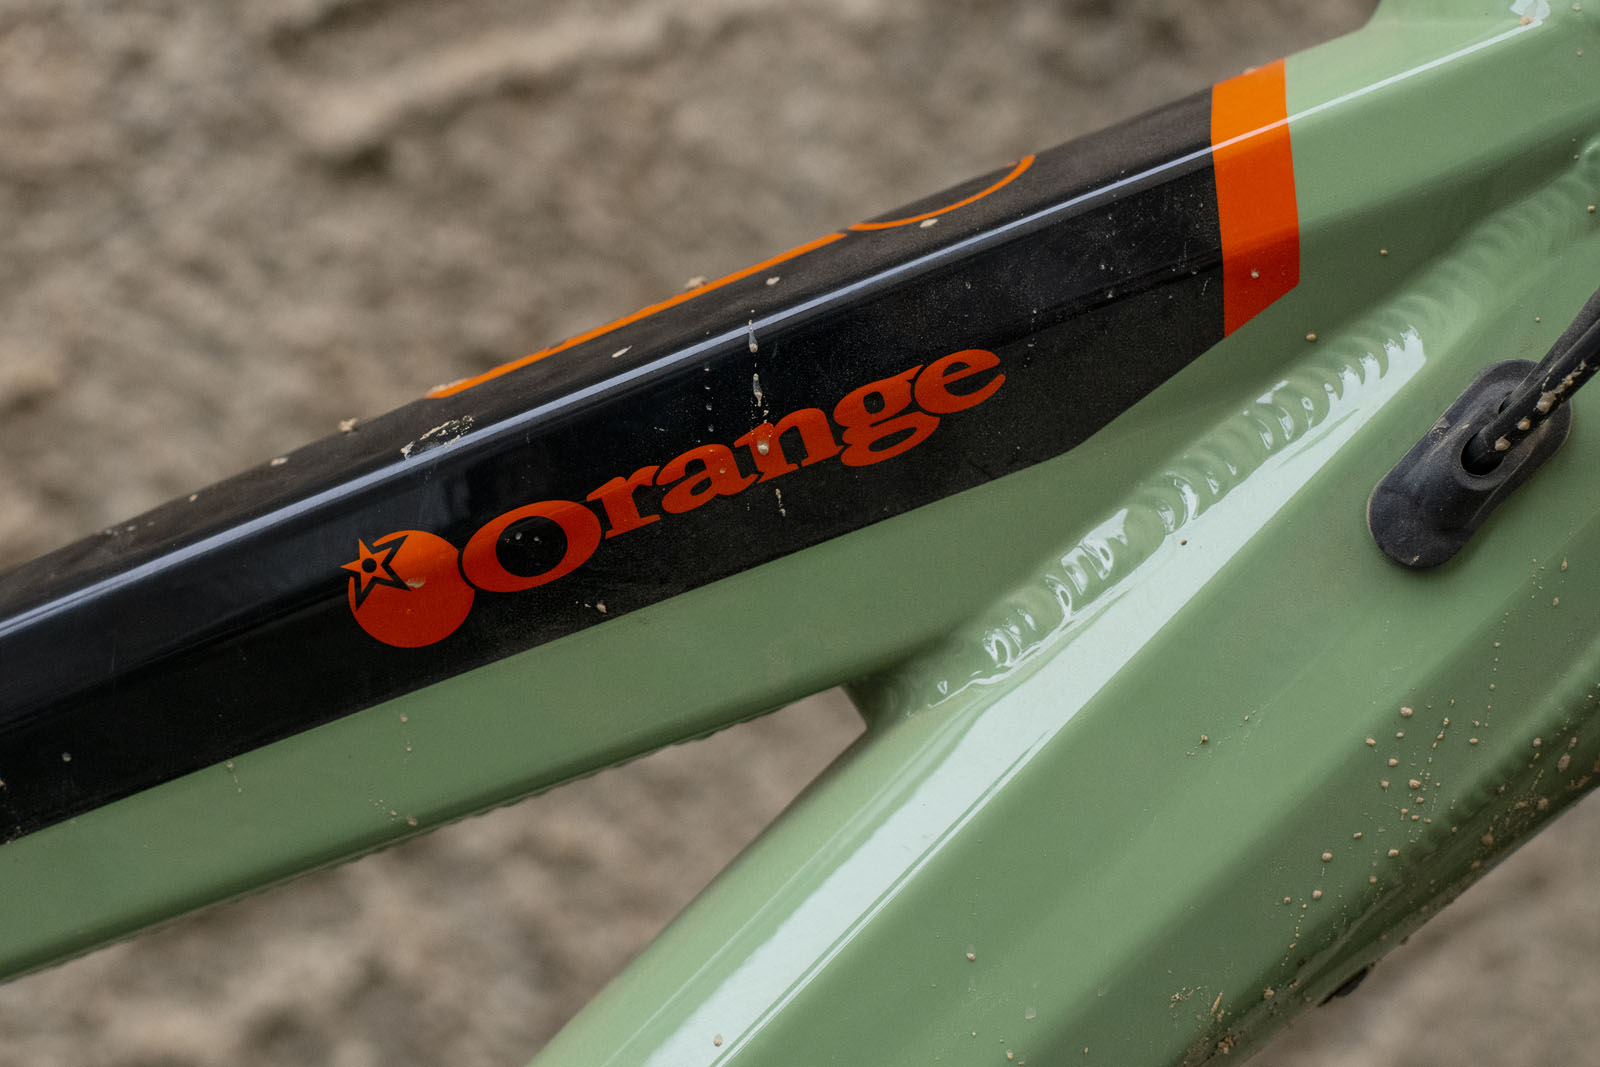 2019 Orange Alpine 6 graphics